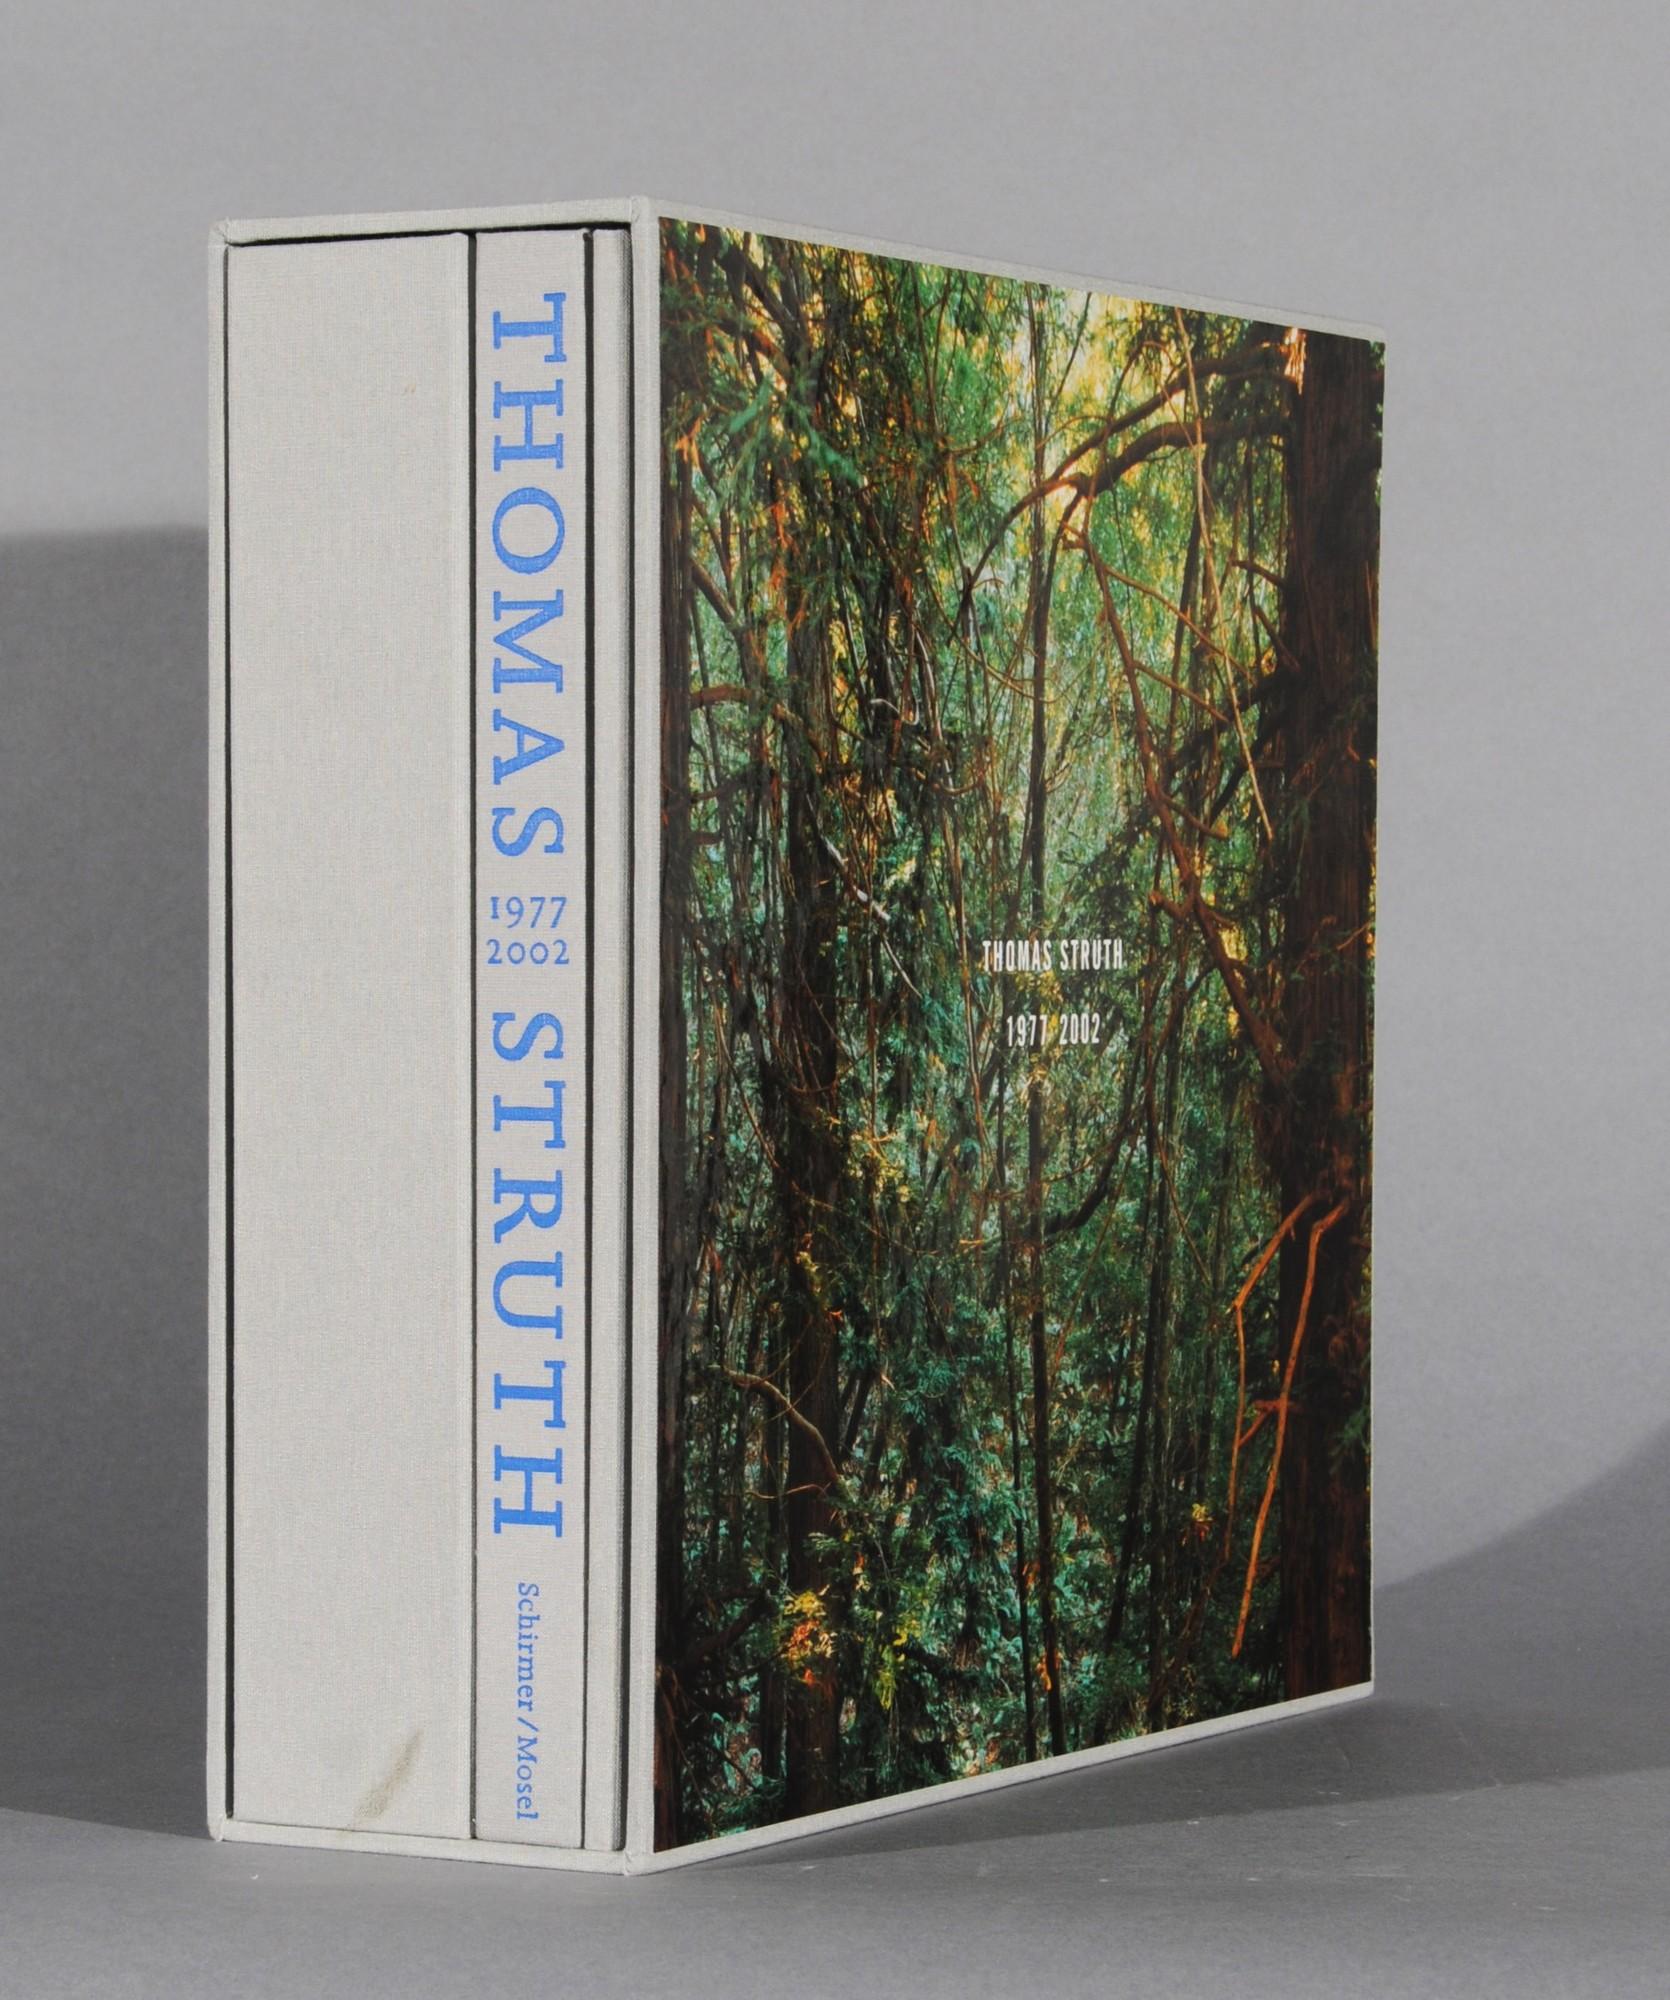 Struth Thomas, Exhibition Book. Retrospektive Thomas Struth 1977-2002. Touring exhibition: Dallas Museum of Art, 2002; The Museum of Contemporary Art, Los Angeles, 2003; The Metropolitan Museum of Art, New York, 2003; Museum of Contemporary Art, Chicago, 2003